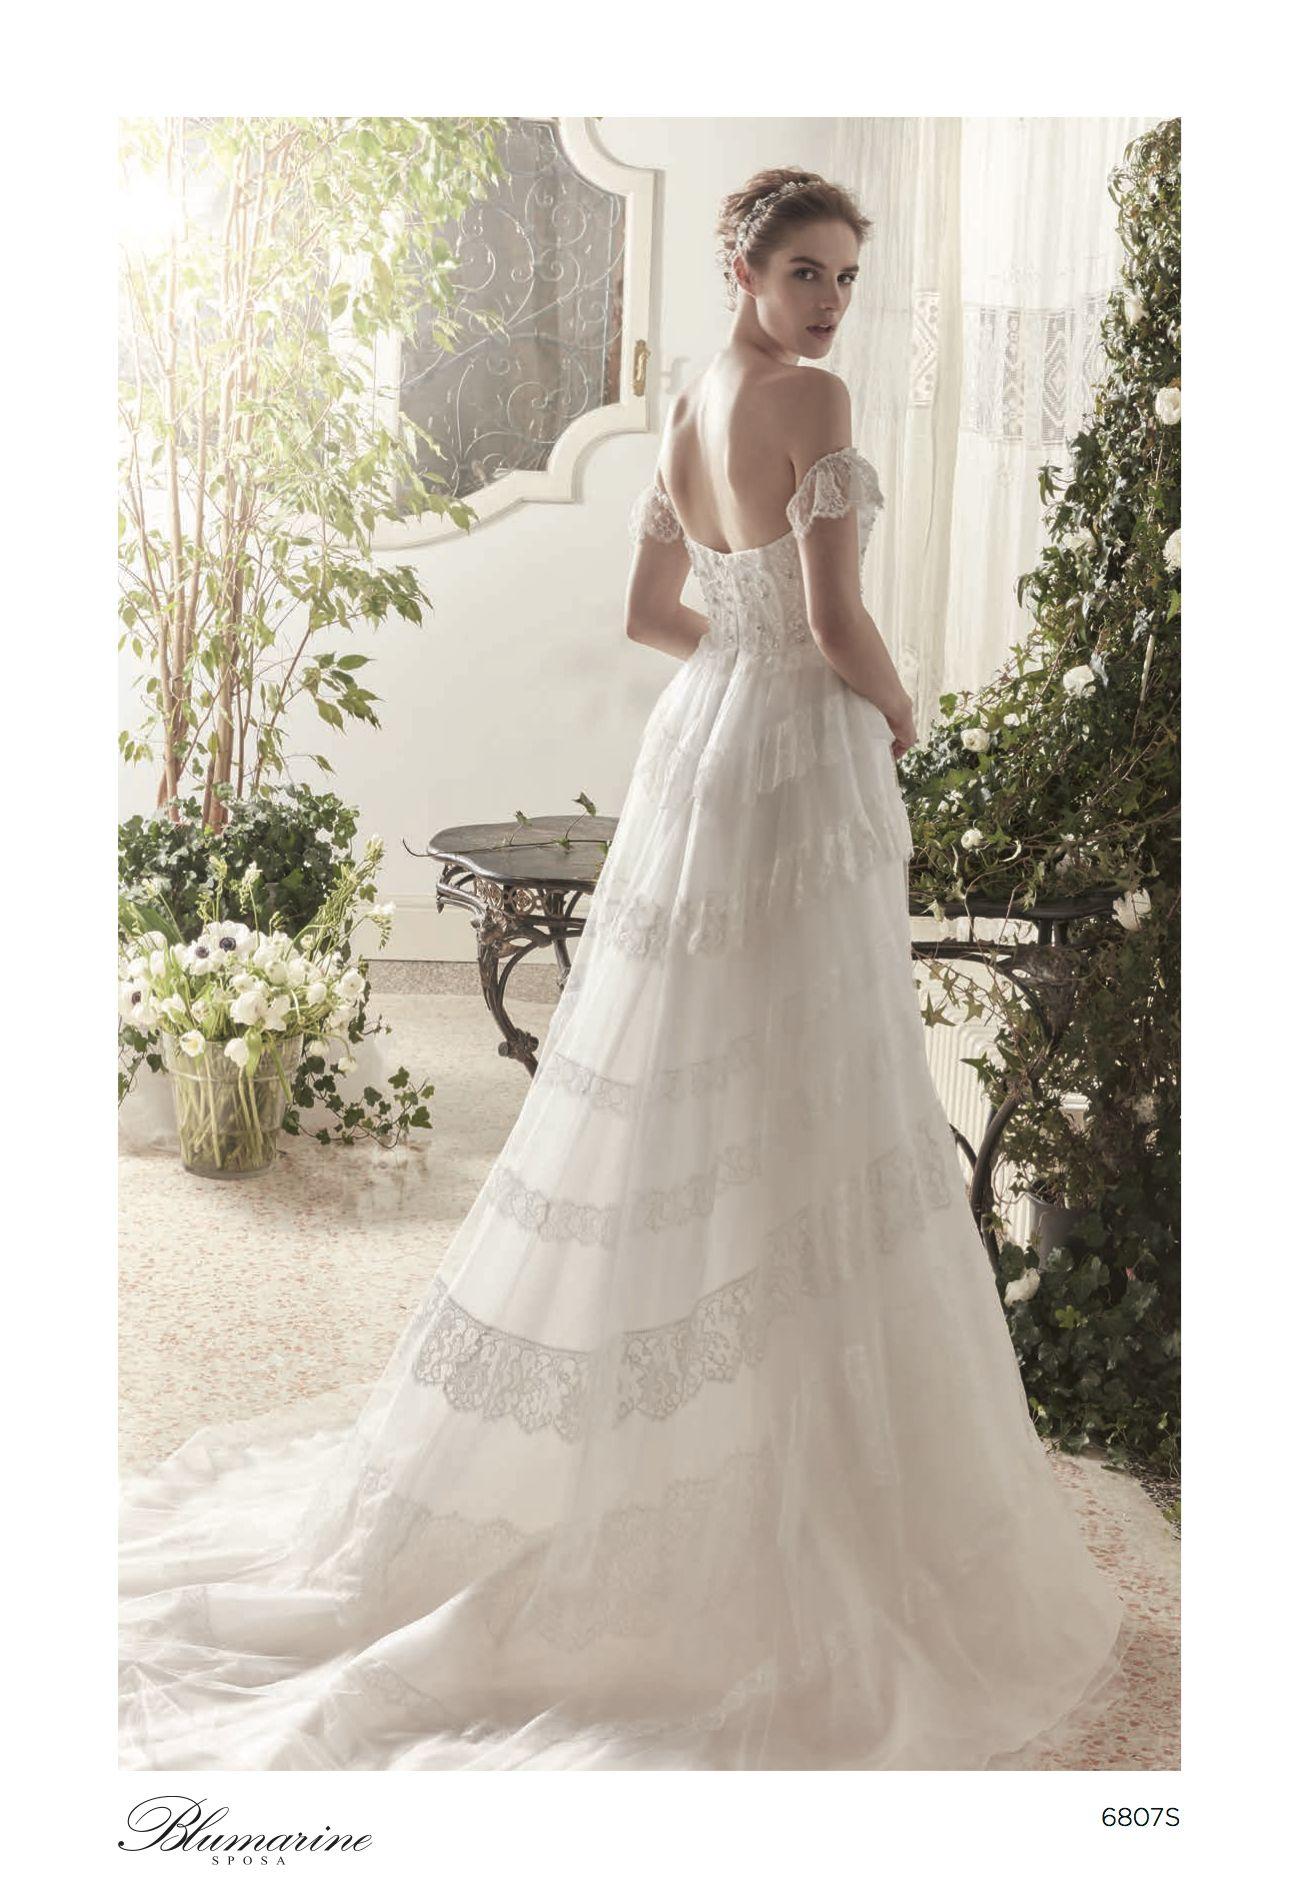 watch cb951 9f75a Blumarine abiti da sposa 2019 nel 2019 | Abiti da sposa ...